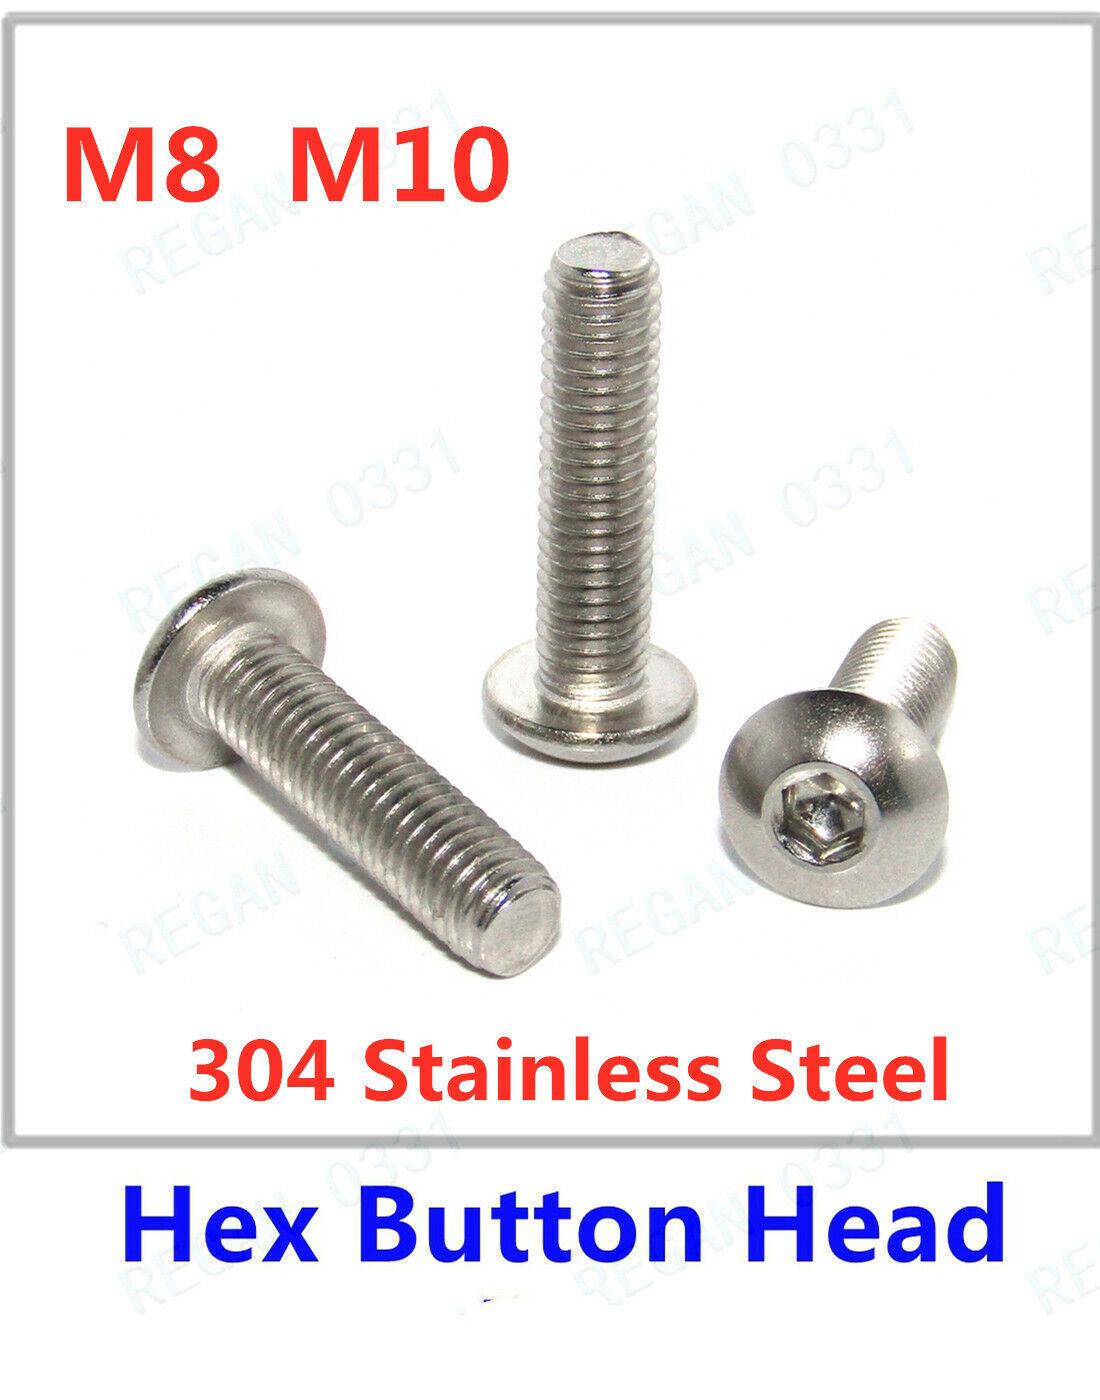 Screw 3 Pcs M12 x 80mm Hex Nut Expansion Anchor Screws Bolts